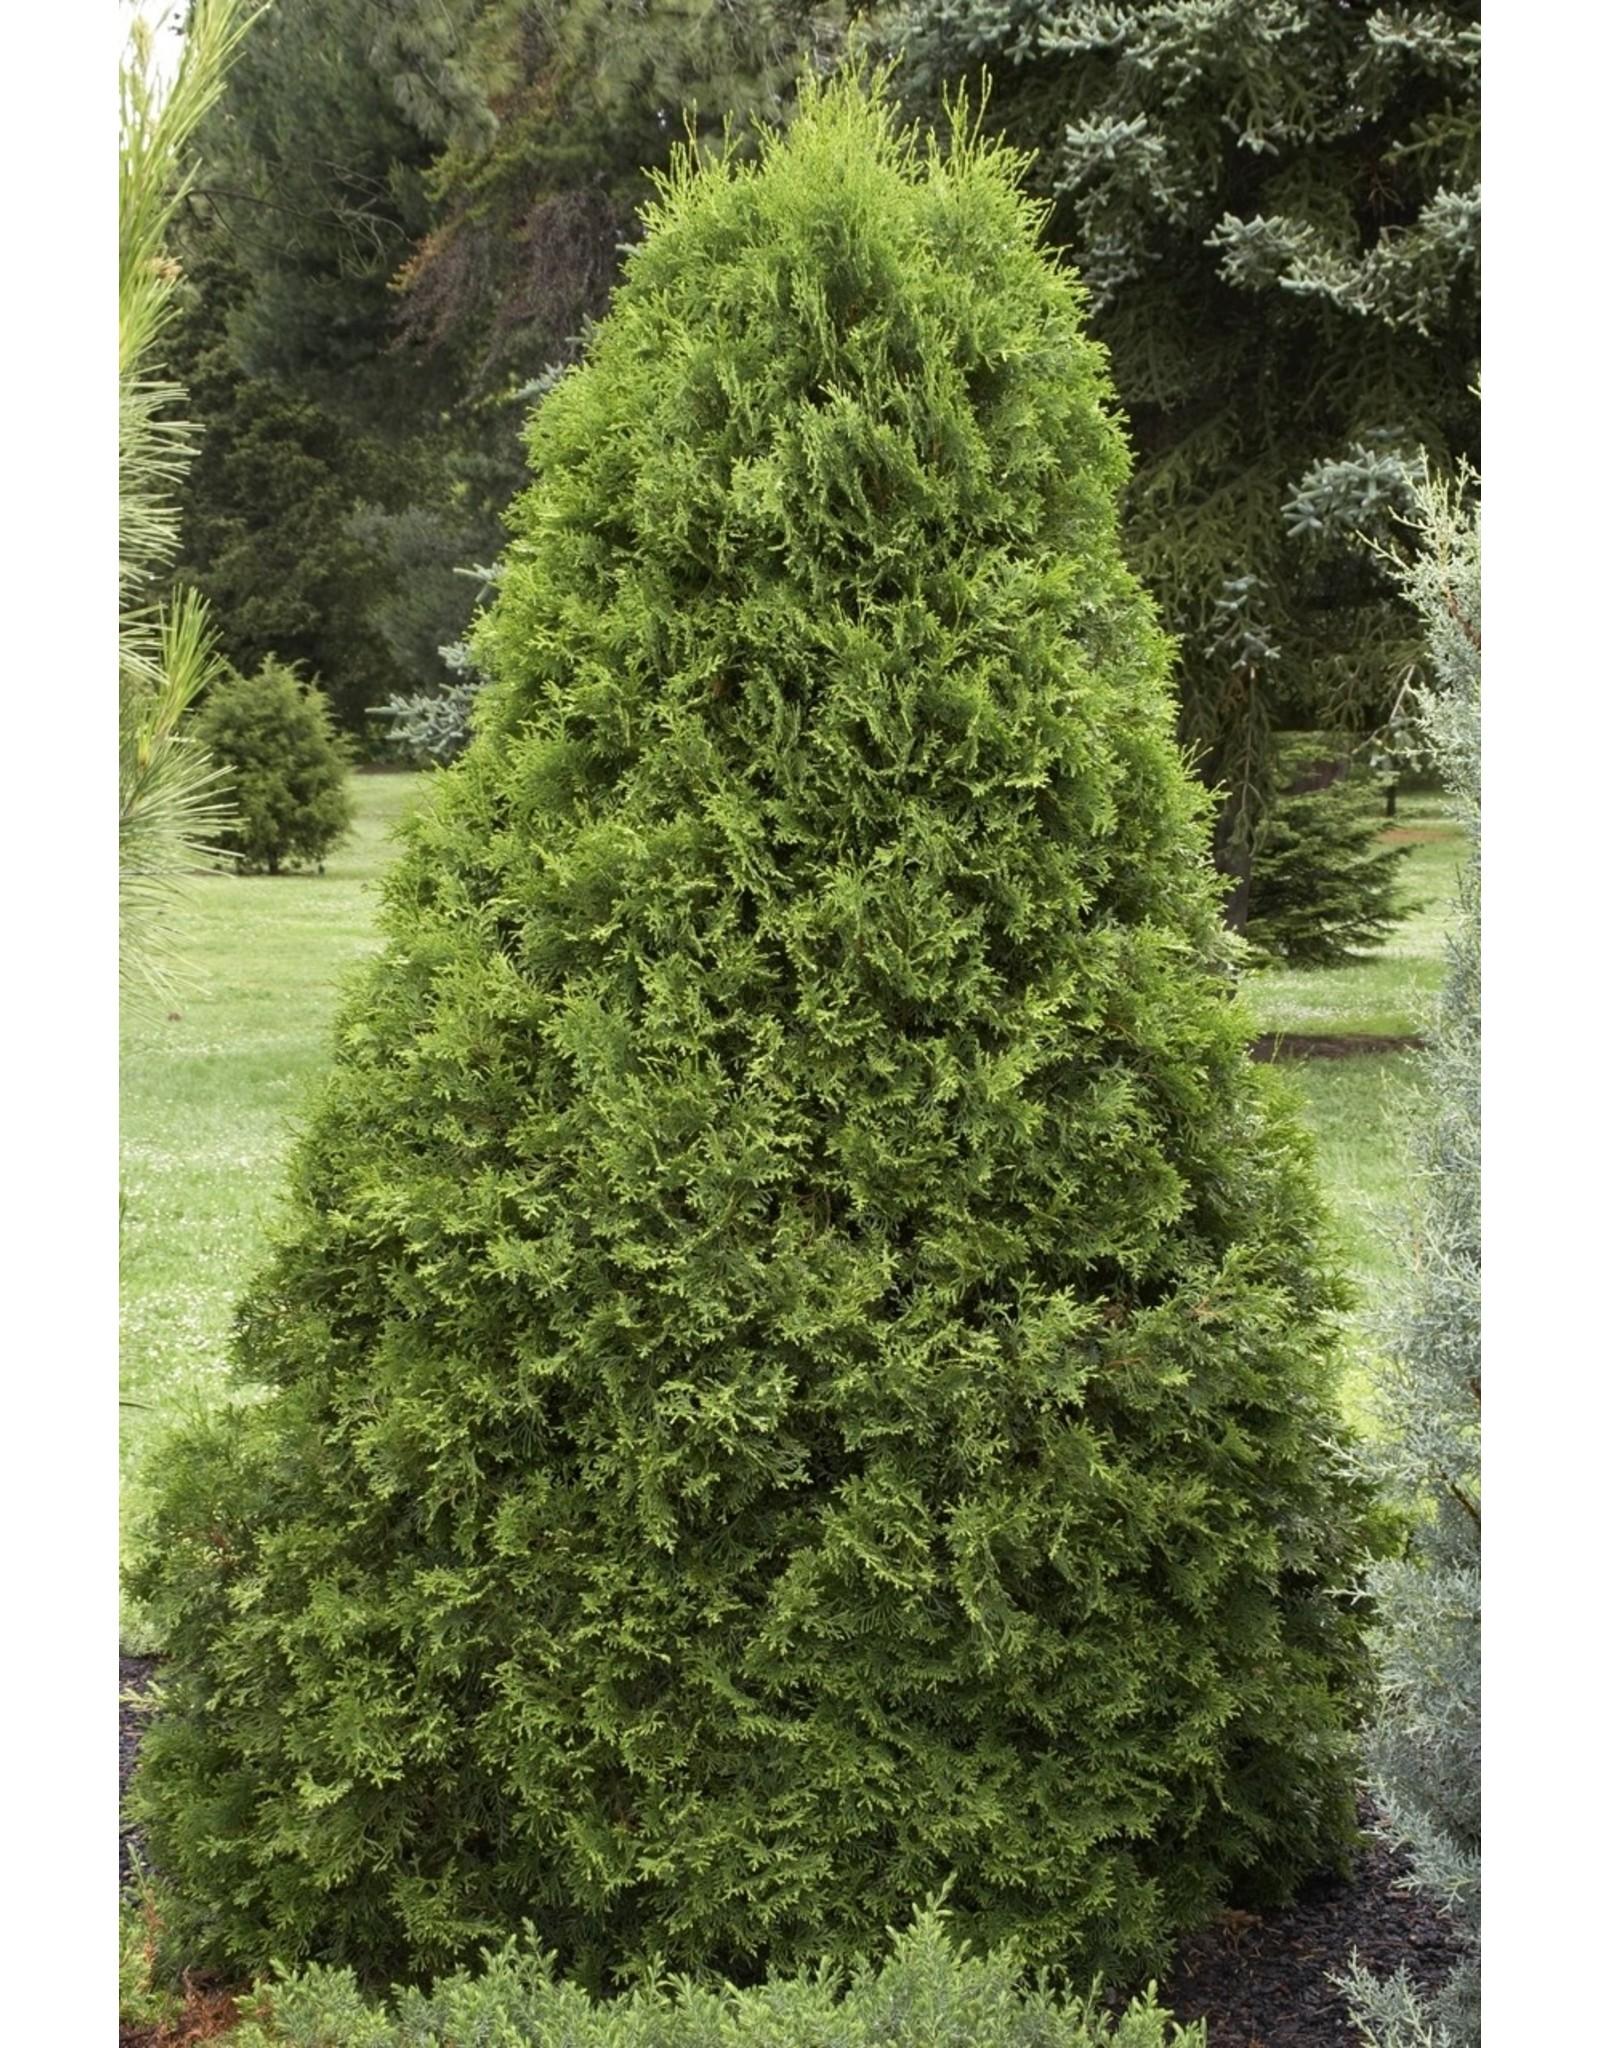 Arborvitae, Emerald Green - Thuja Occidentalis 'Emerald' #5